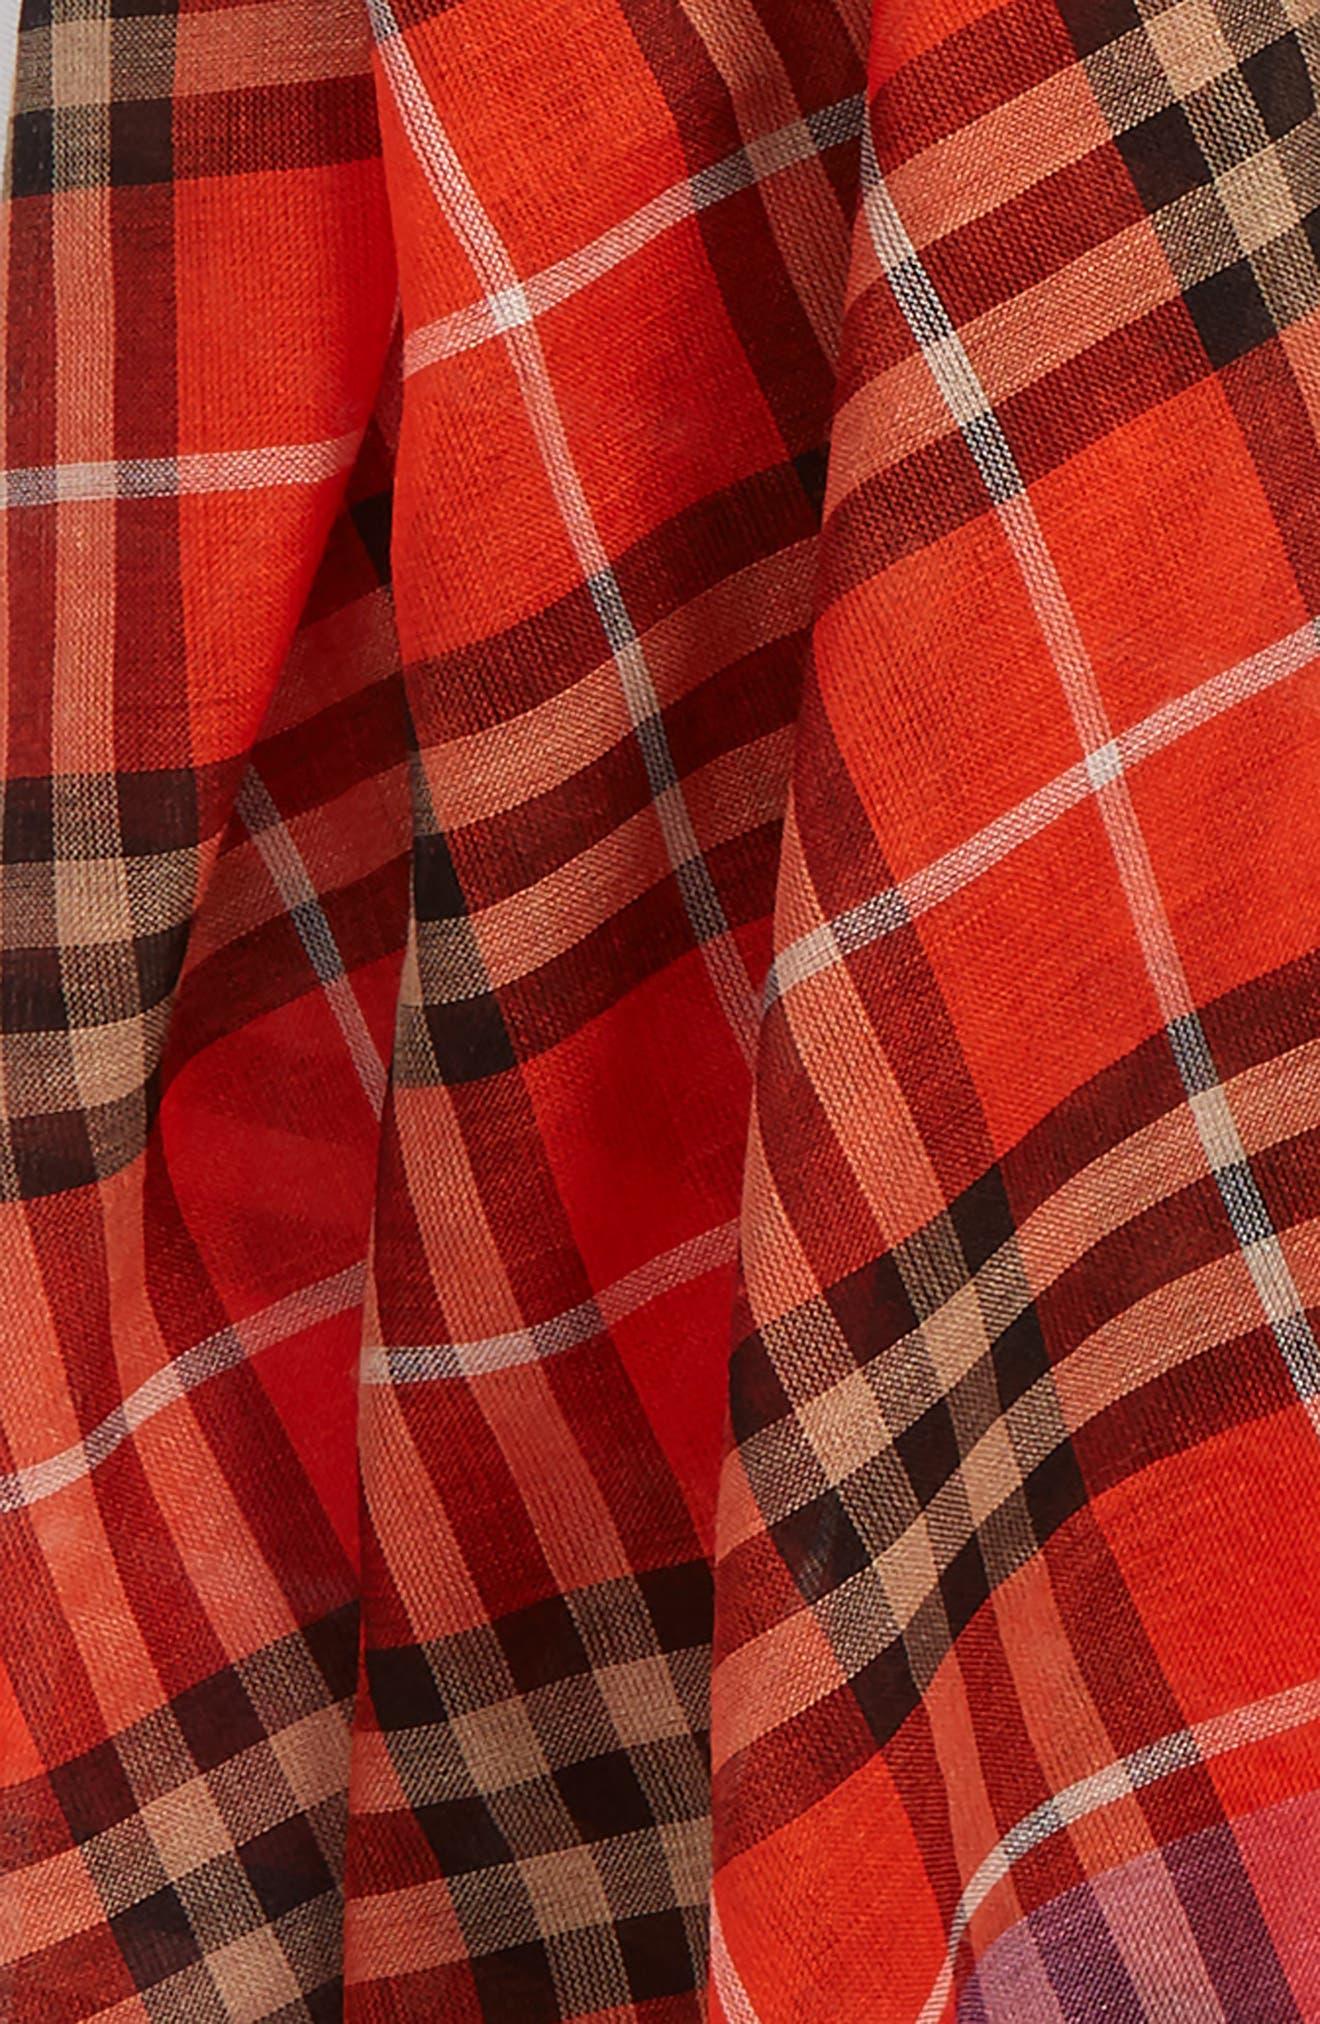 Border Vintage Check Wool & Silk Scarf,                             Alternate thumbnail 3, color,                             Orange Red